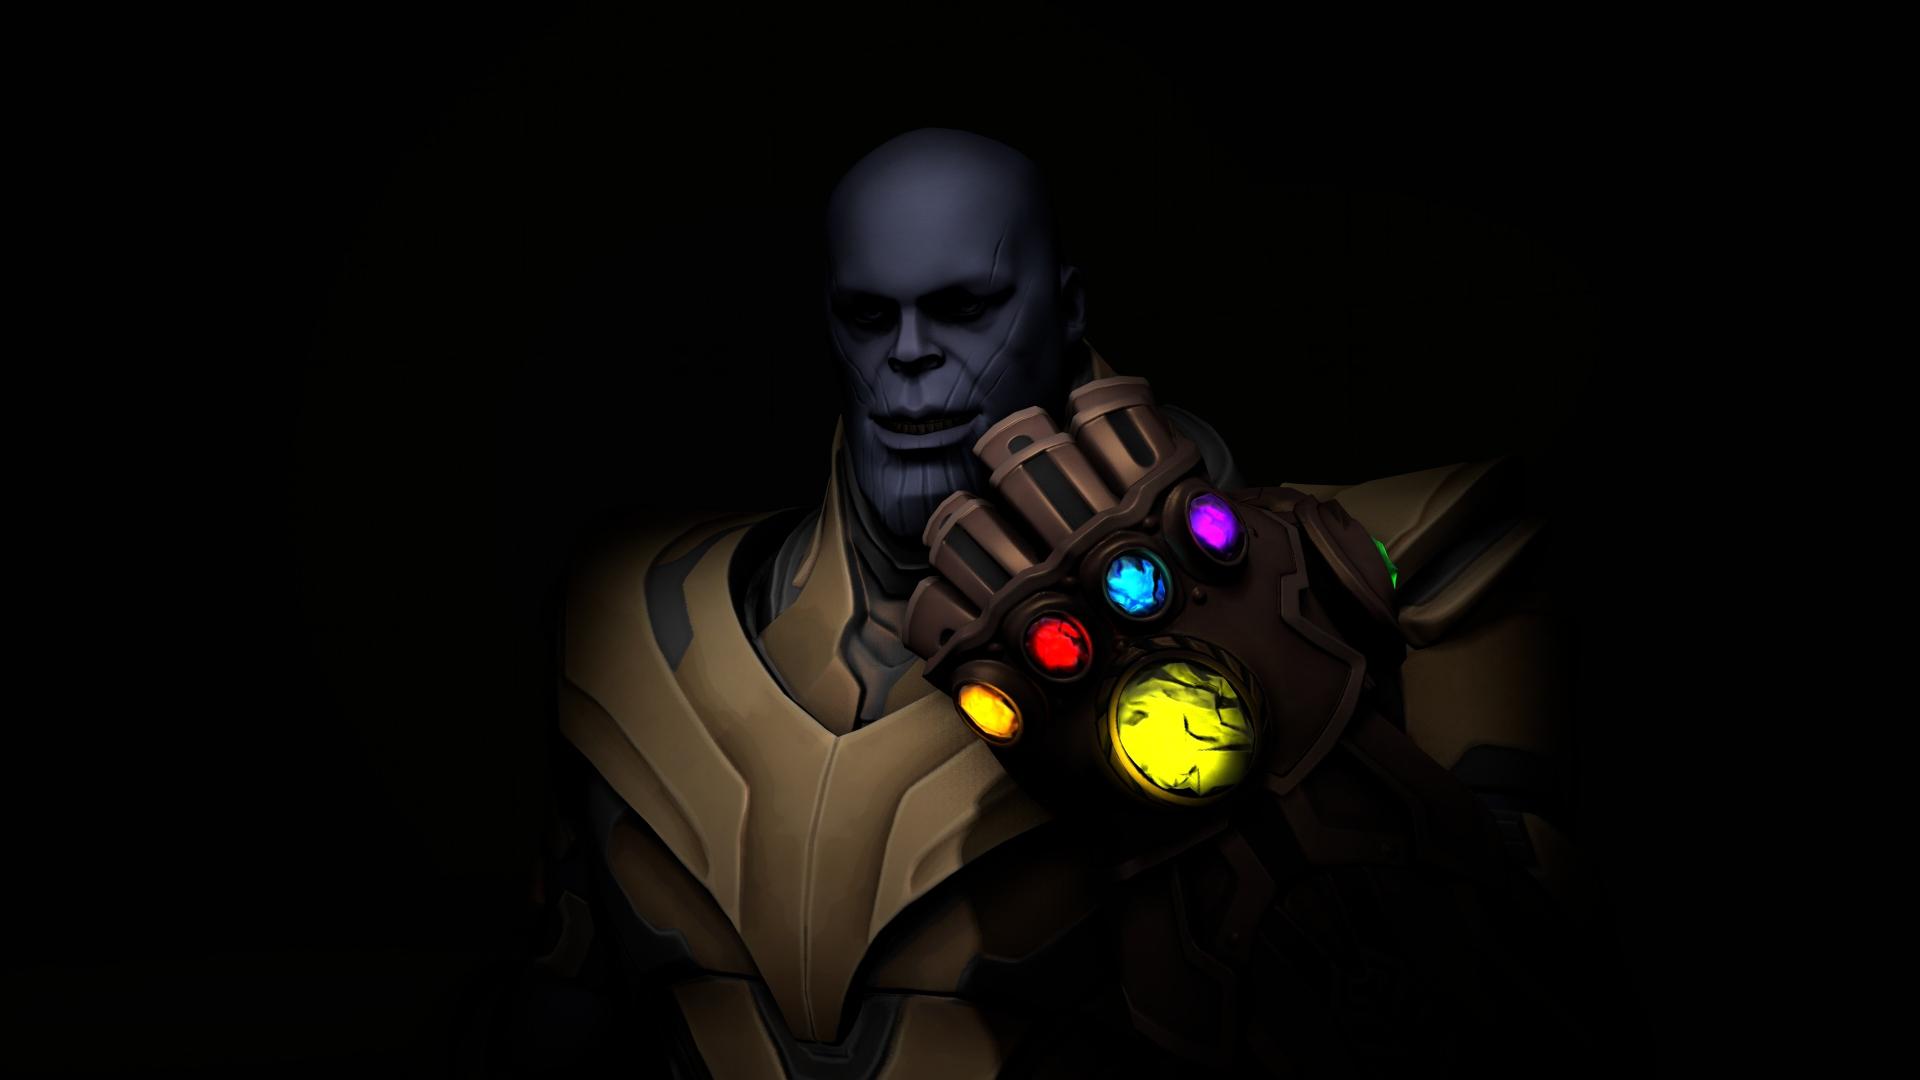 1920x1080 Galaxy Man Fortnite Season 6 4k Laptop Full Hd: Download 1920x1080 Wallpaper Thanos, Video Game, Villain